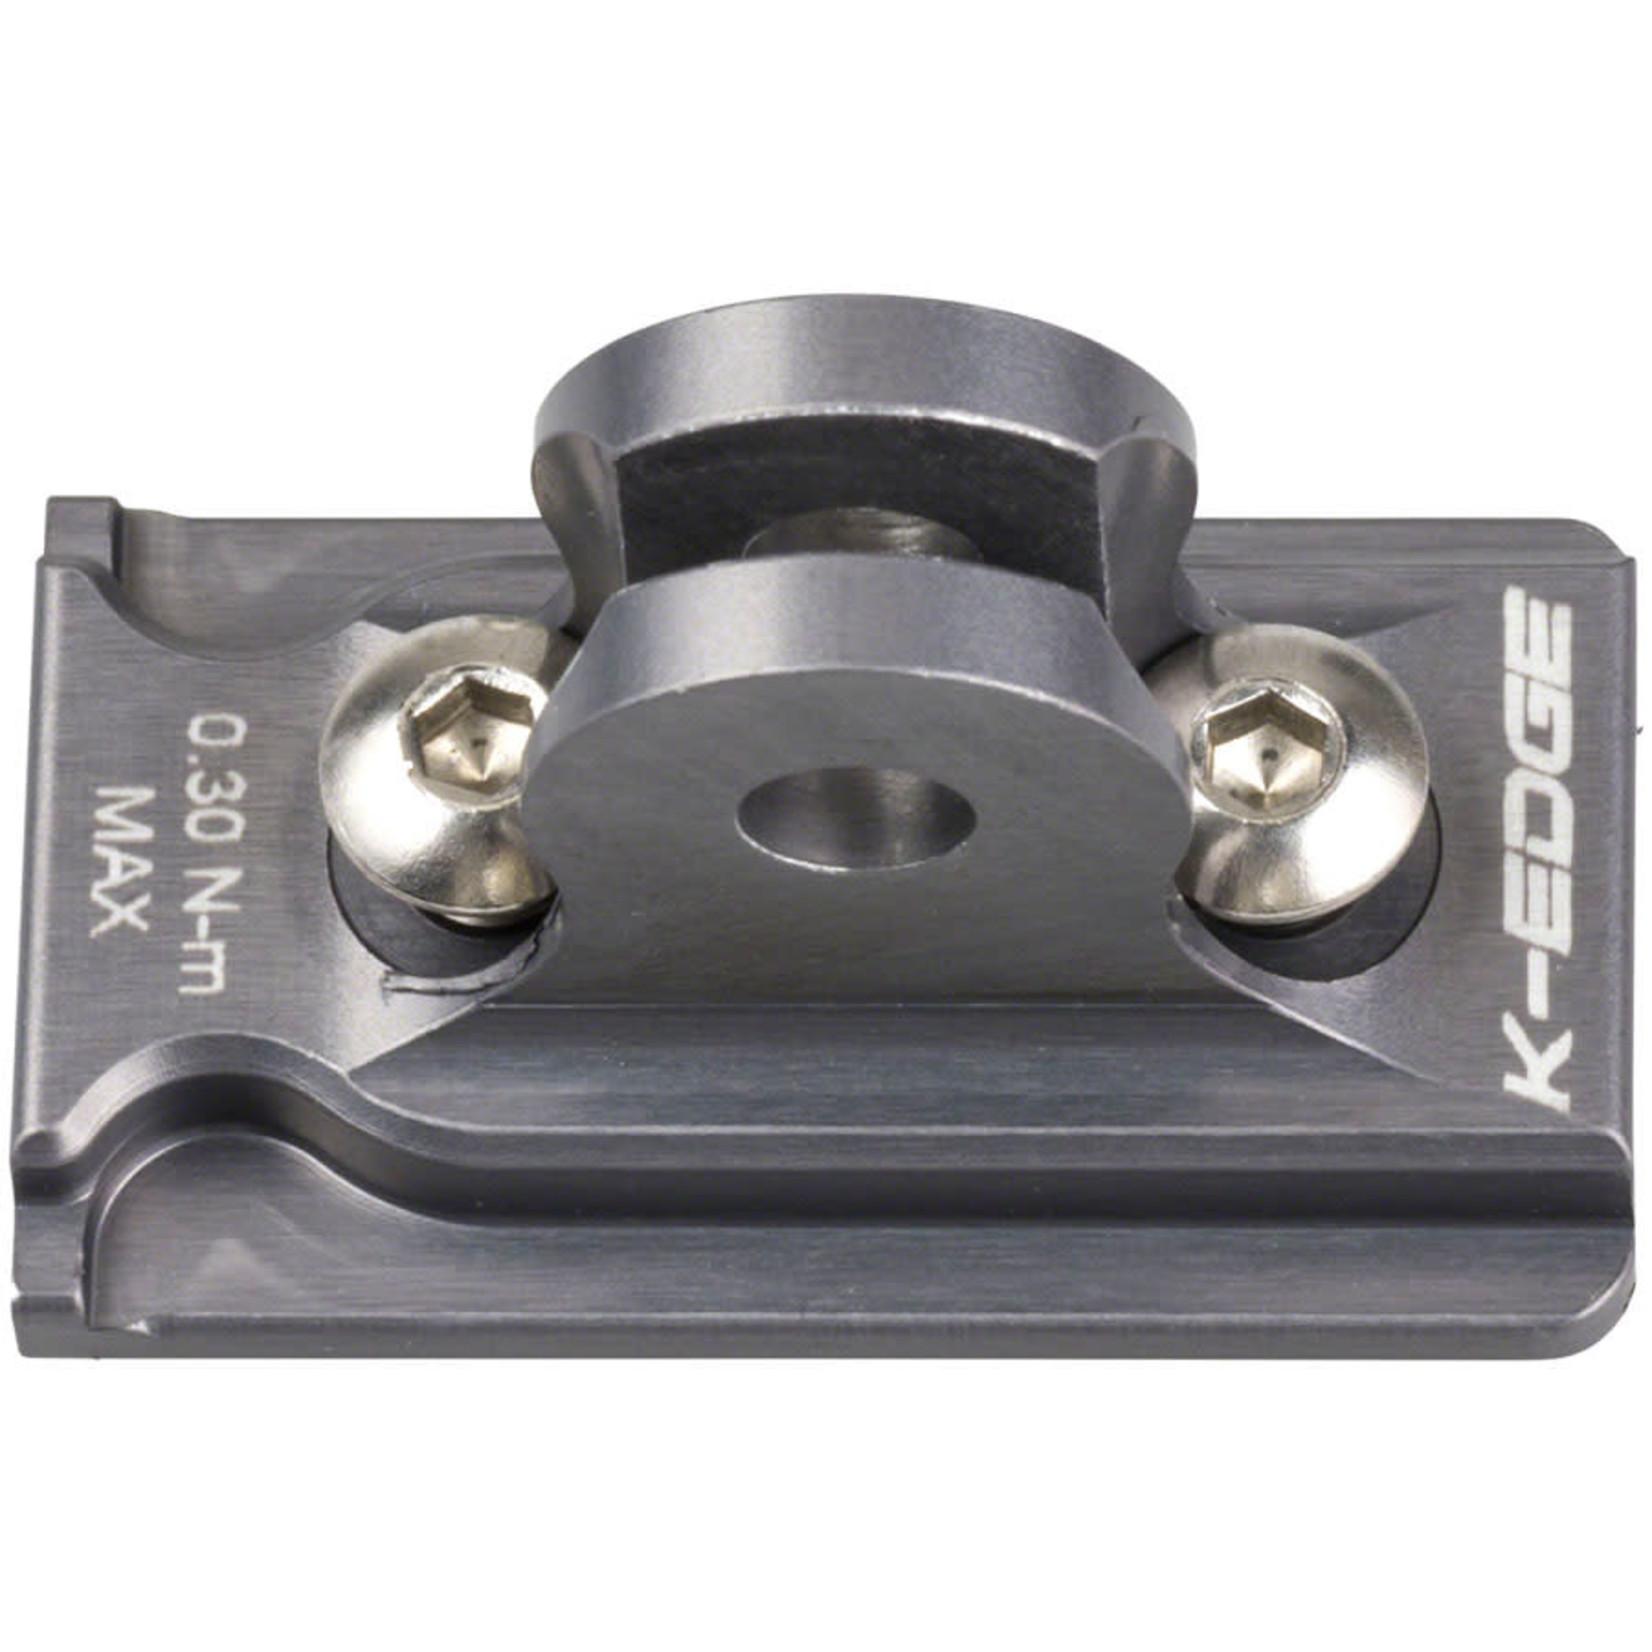 K-Edge K-EDGE NiteRider Adapter: for K-EDGE Go Big Mounts and Combo Mounts, Gun Metal